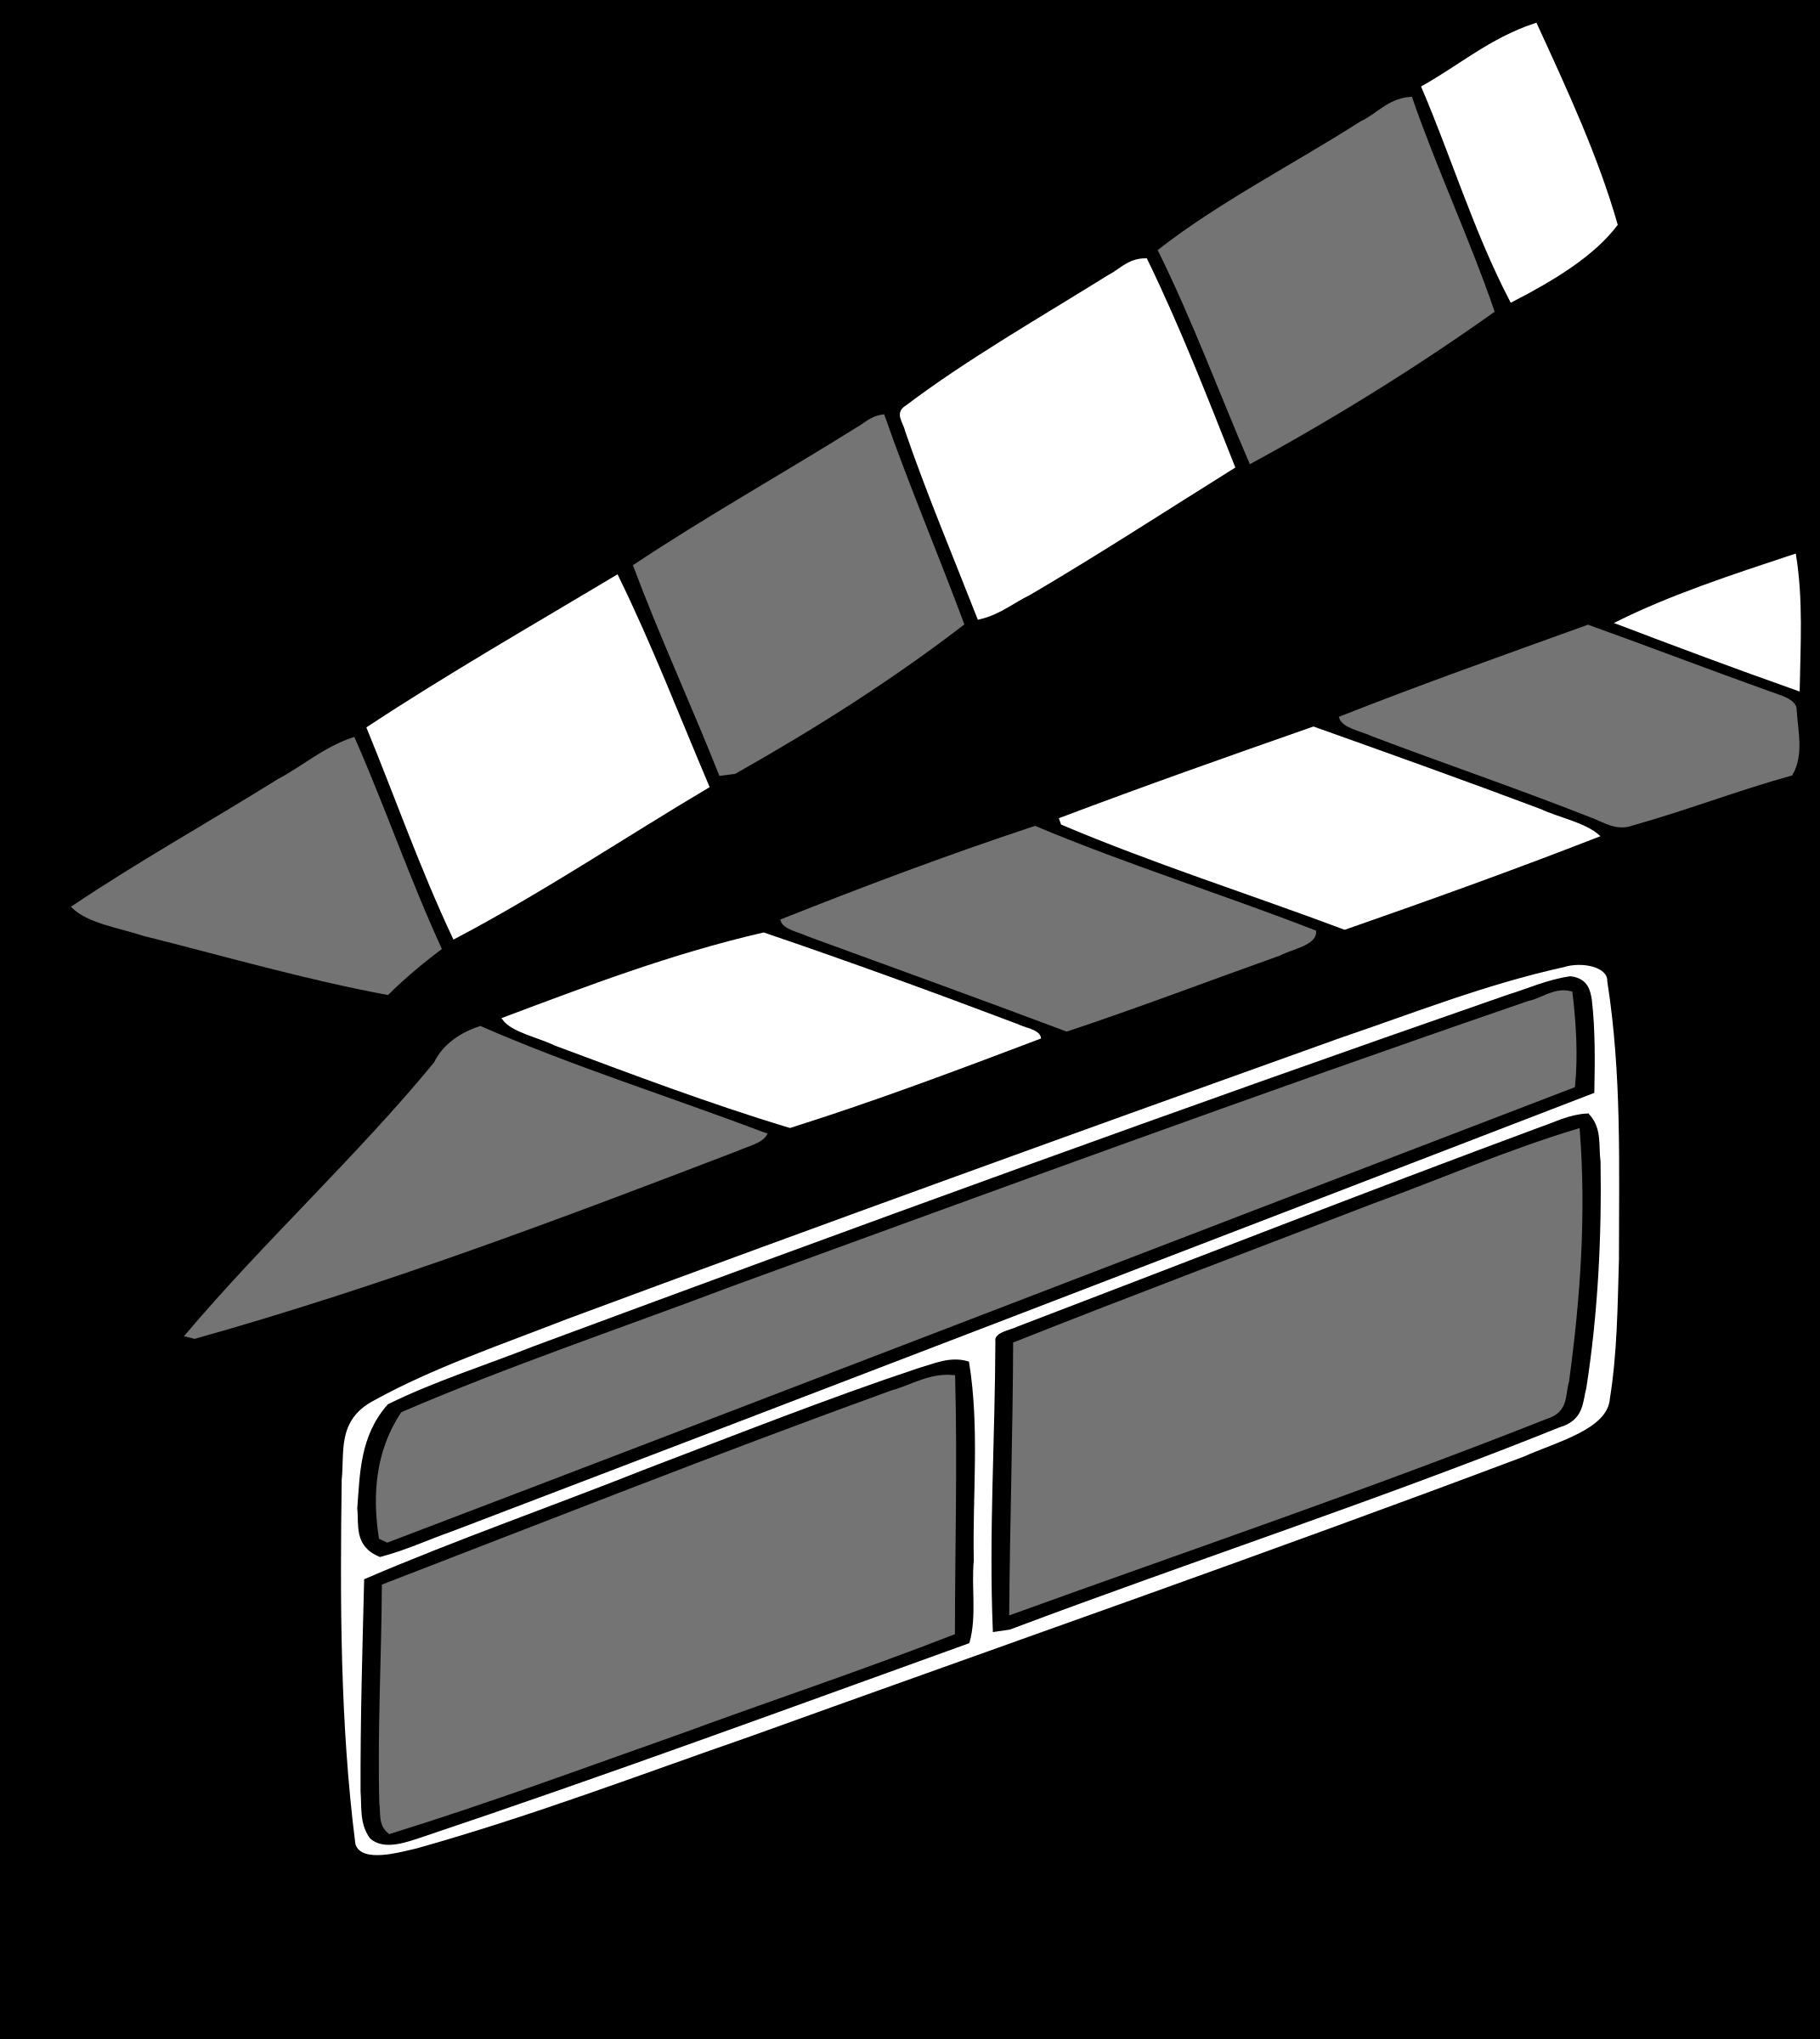 Clipart - Film Clapper